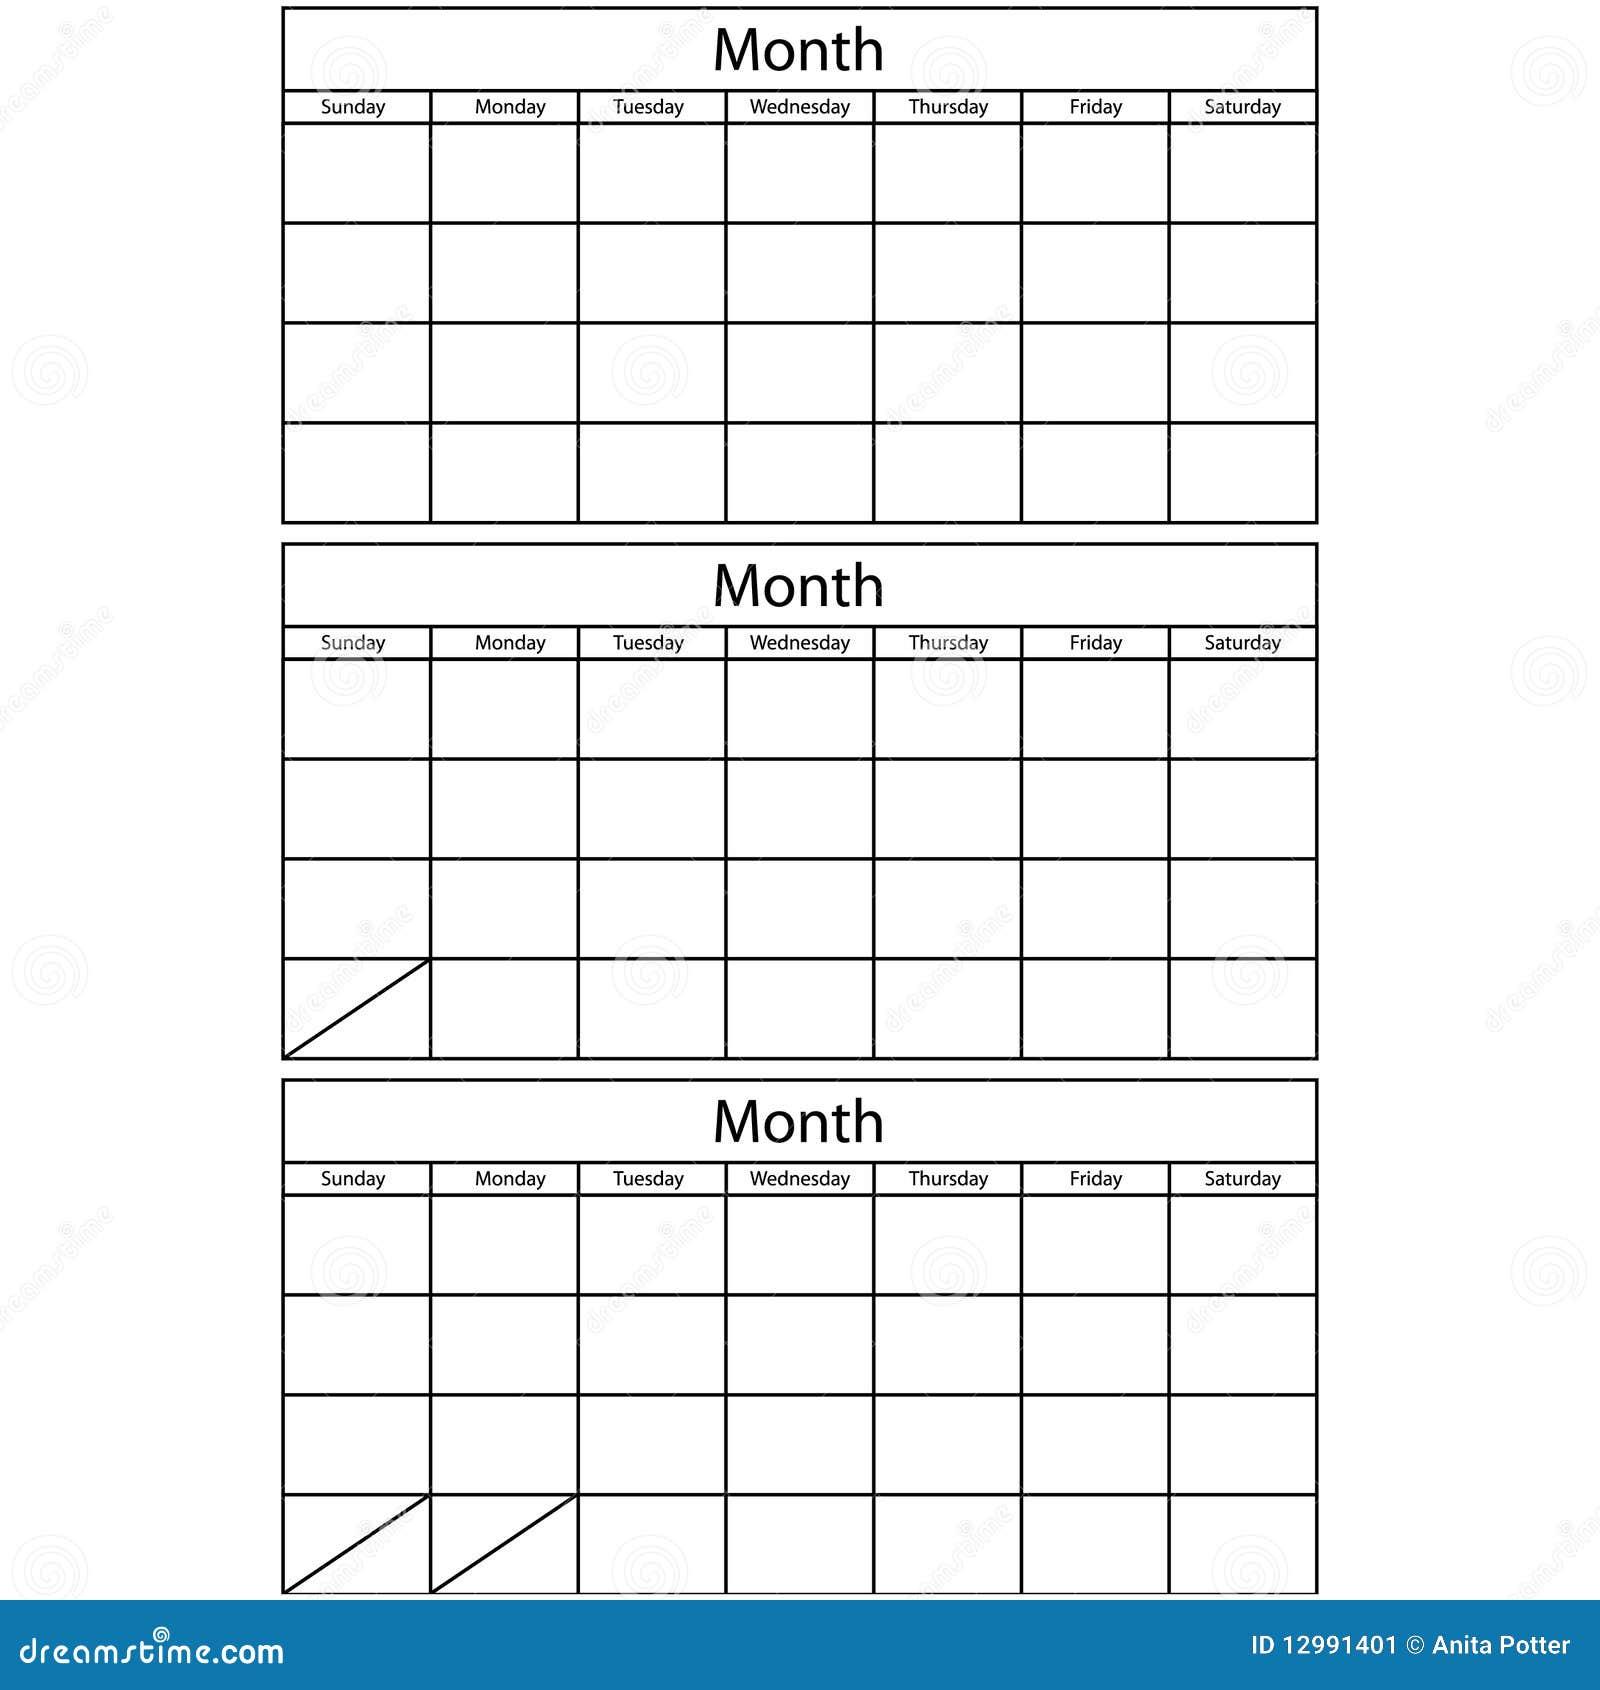 Blank mallar f r kalender 3 fotografering f r bildbyr er for 2 month calendar template 2014